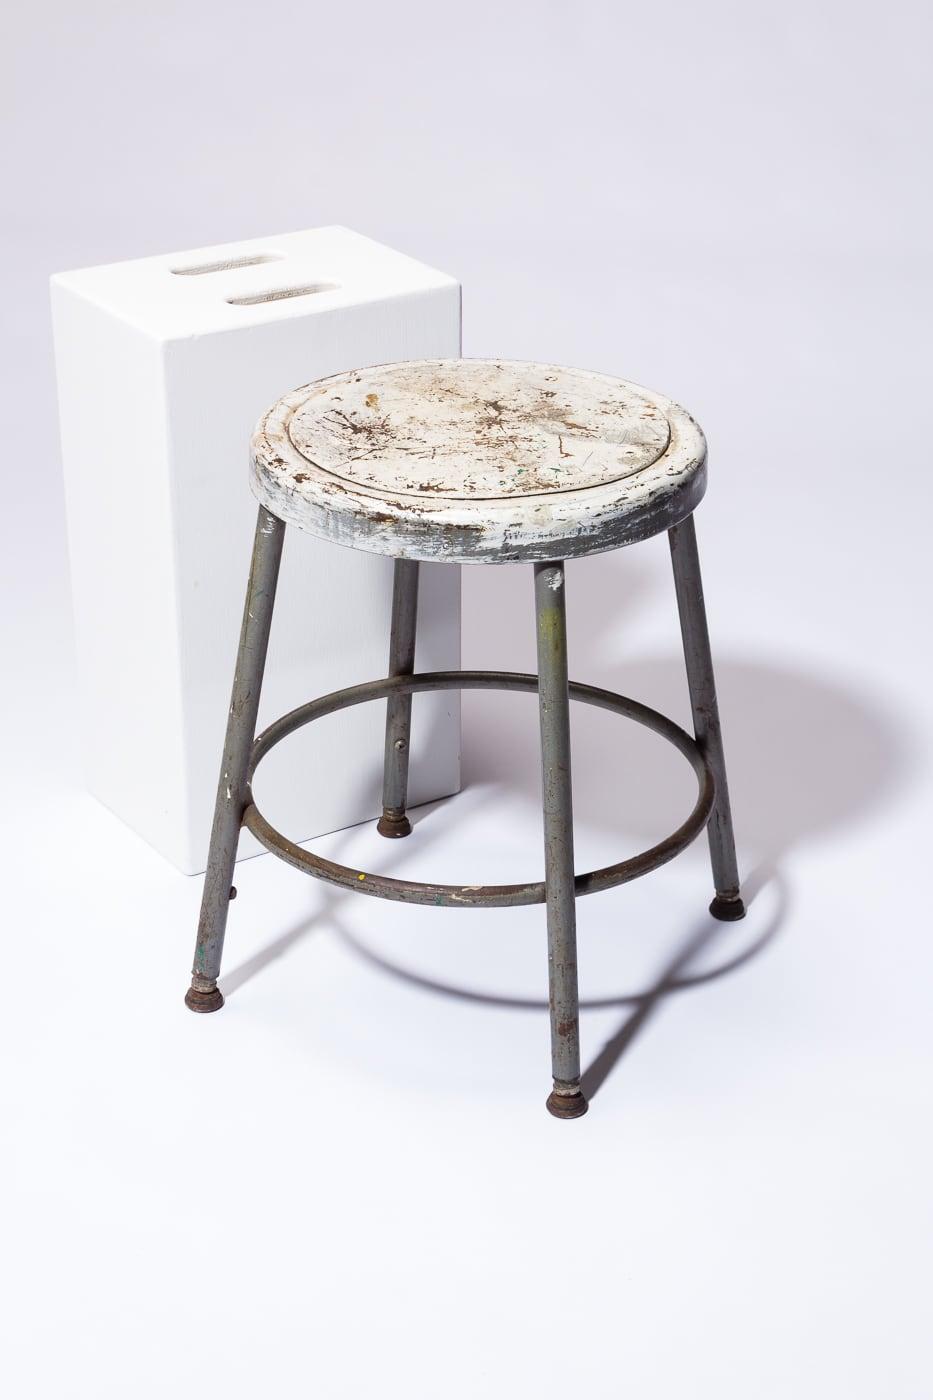 Admirable St229 Alca Distresed Low Stool Prop Rental Acme Brooklyn Uwap Interior Chair Design Uwaporg